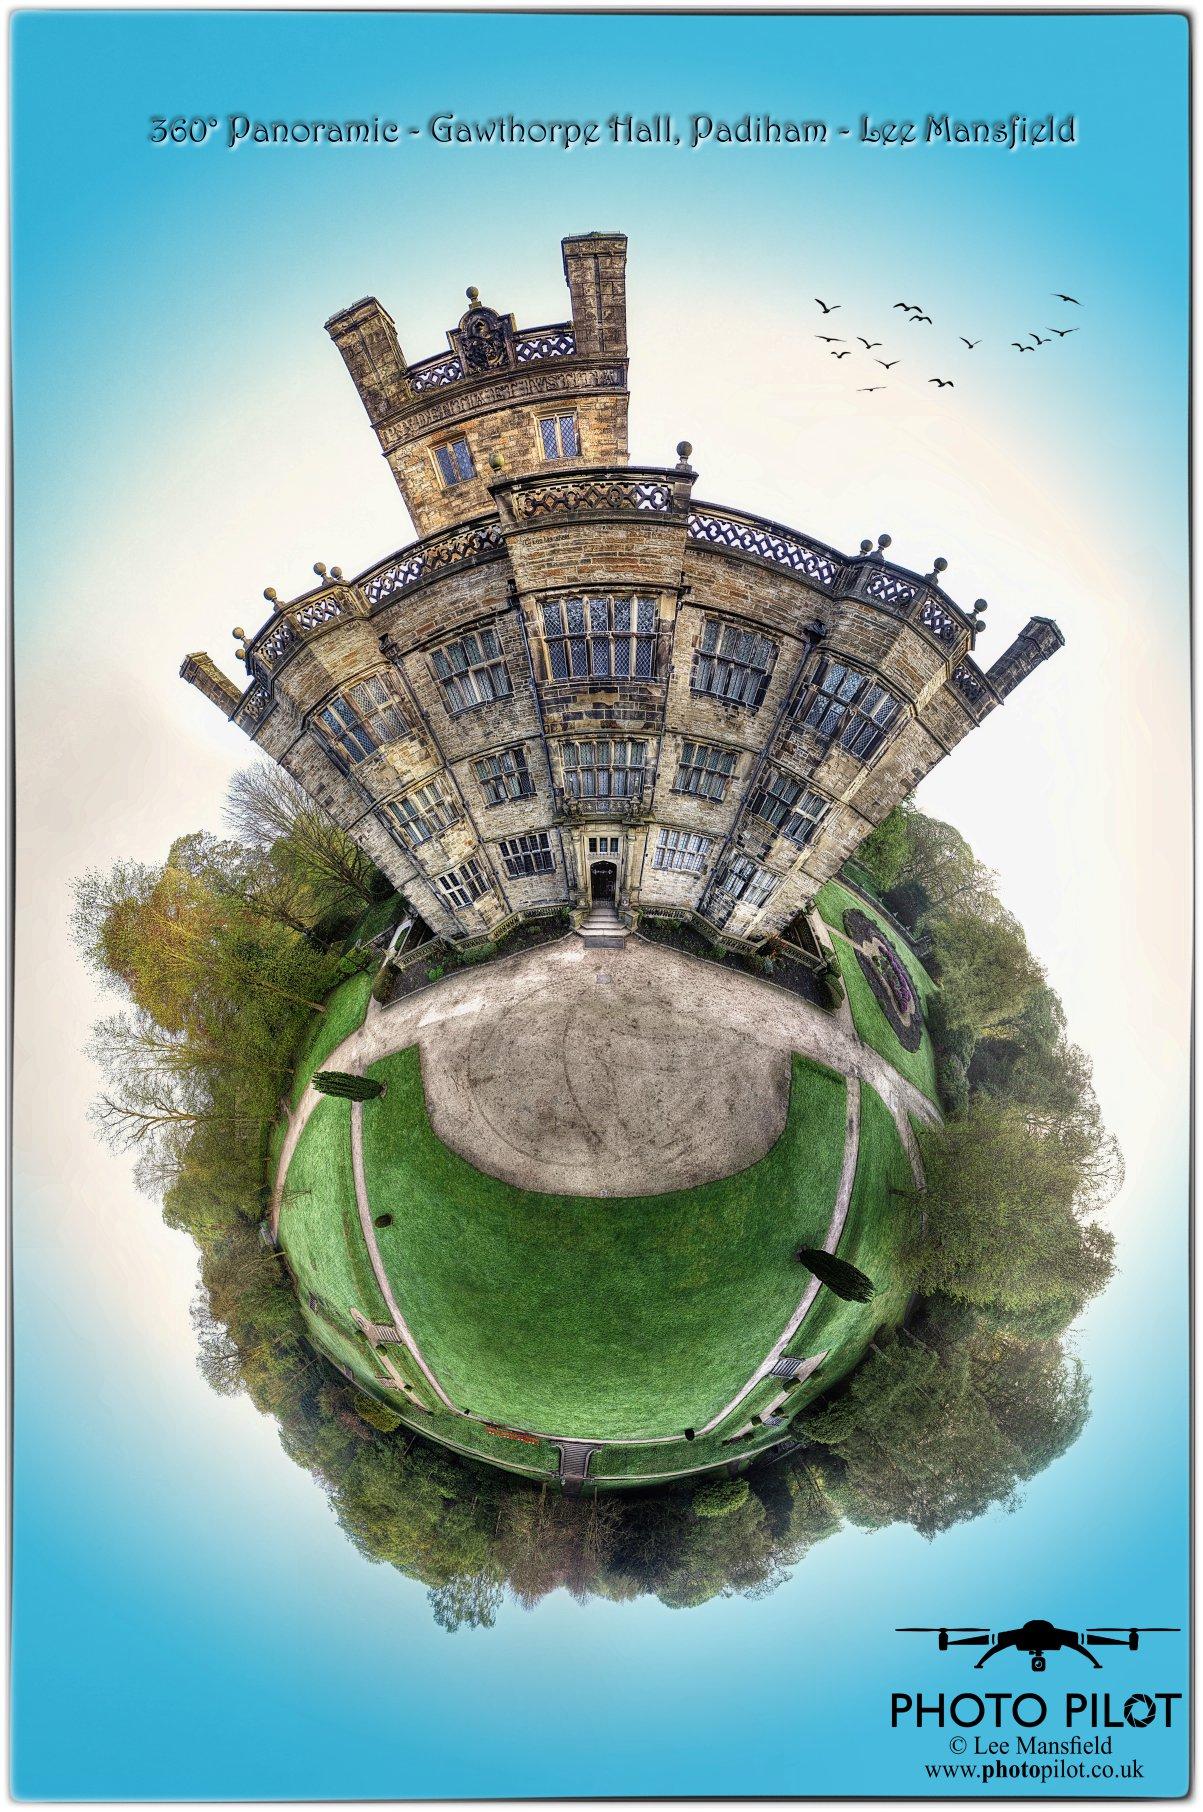 Gawthorpe Hall 360